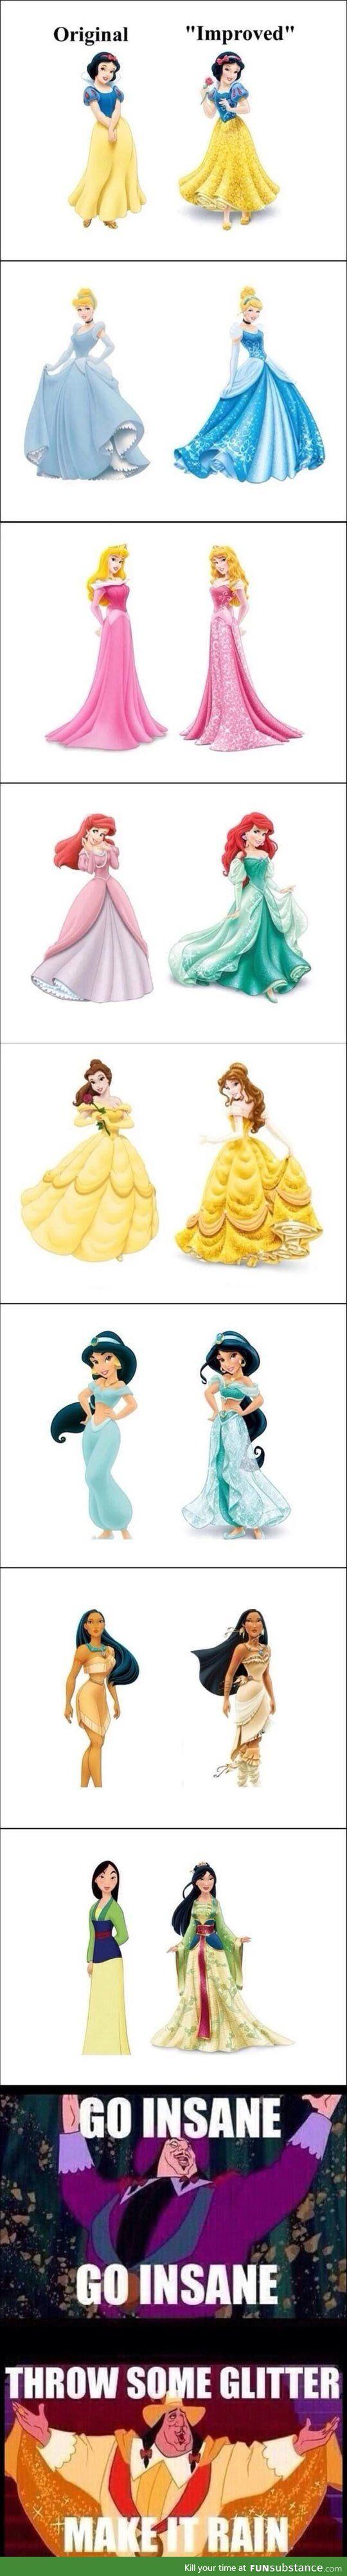 Improved Versions of Disney Princesses